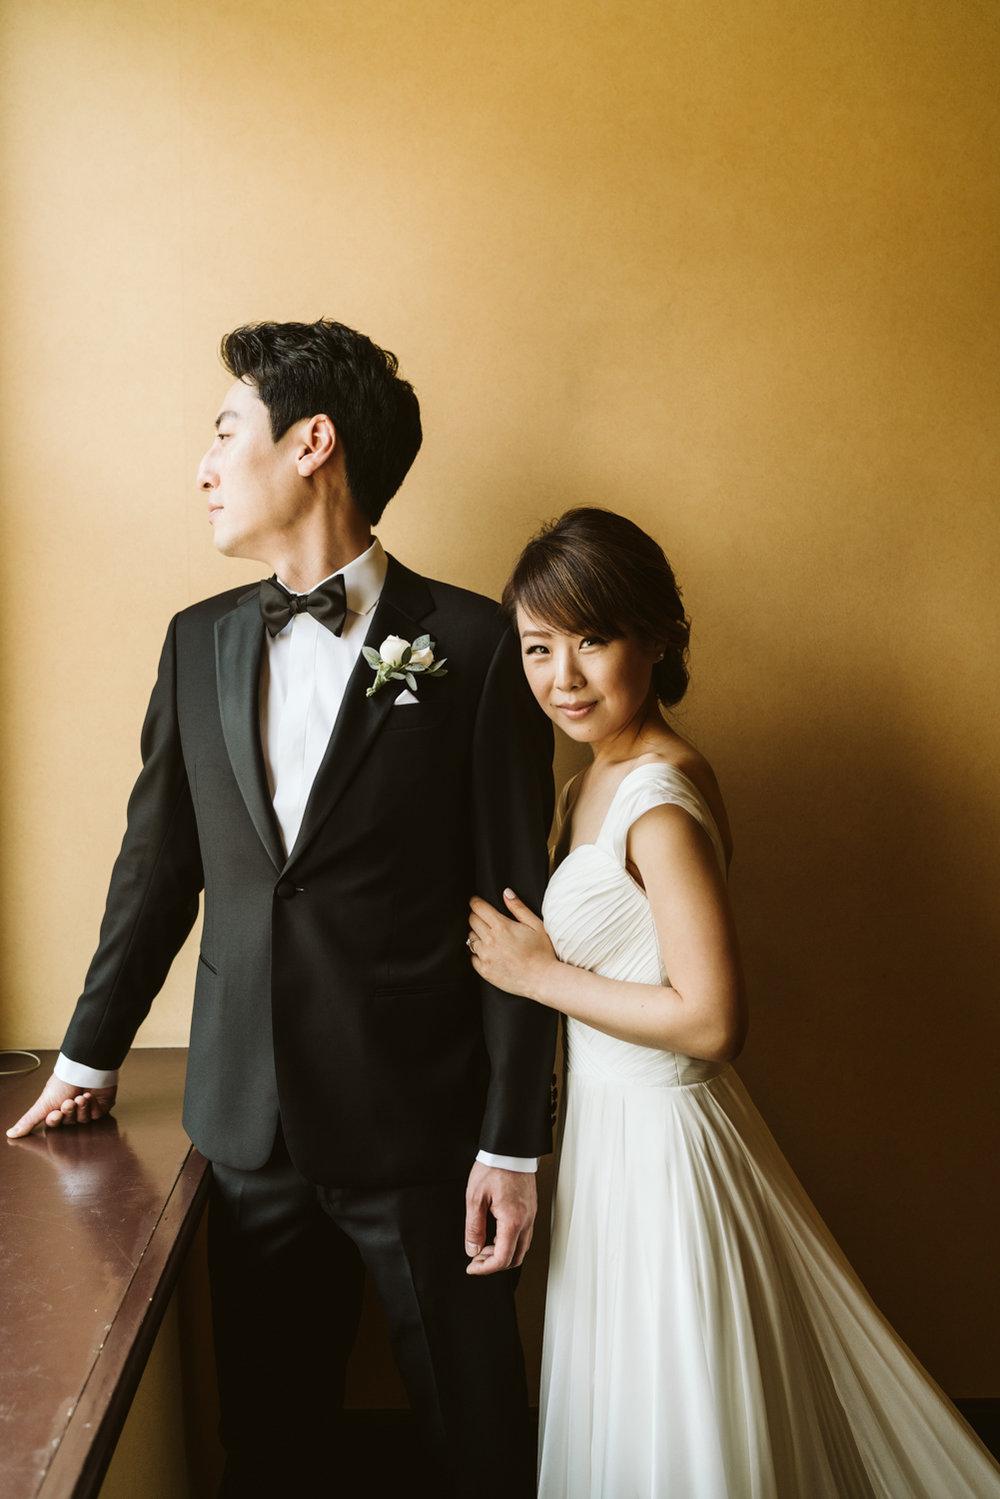 April Yentas Photography - Kristen & Jeff Wedding-15.jpg